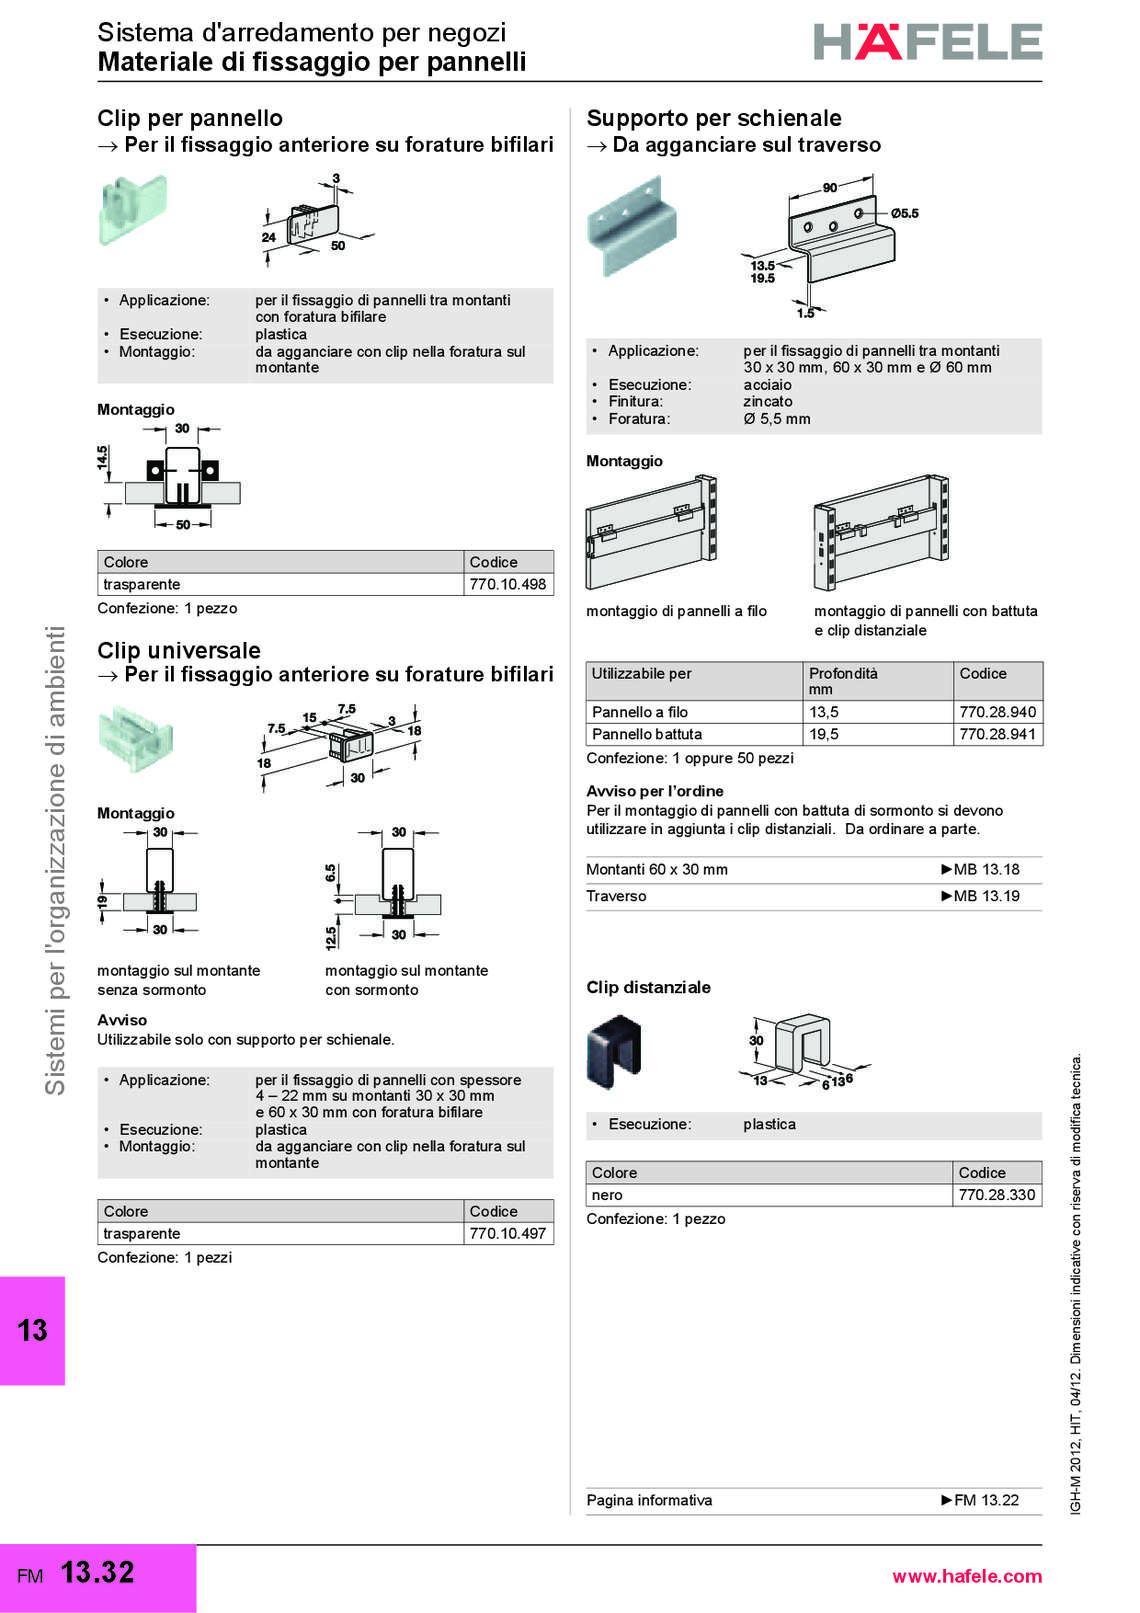 hafele-arredo-negozi-e-farmacie_32_043.jpg